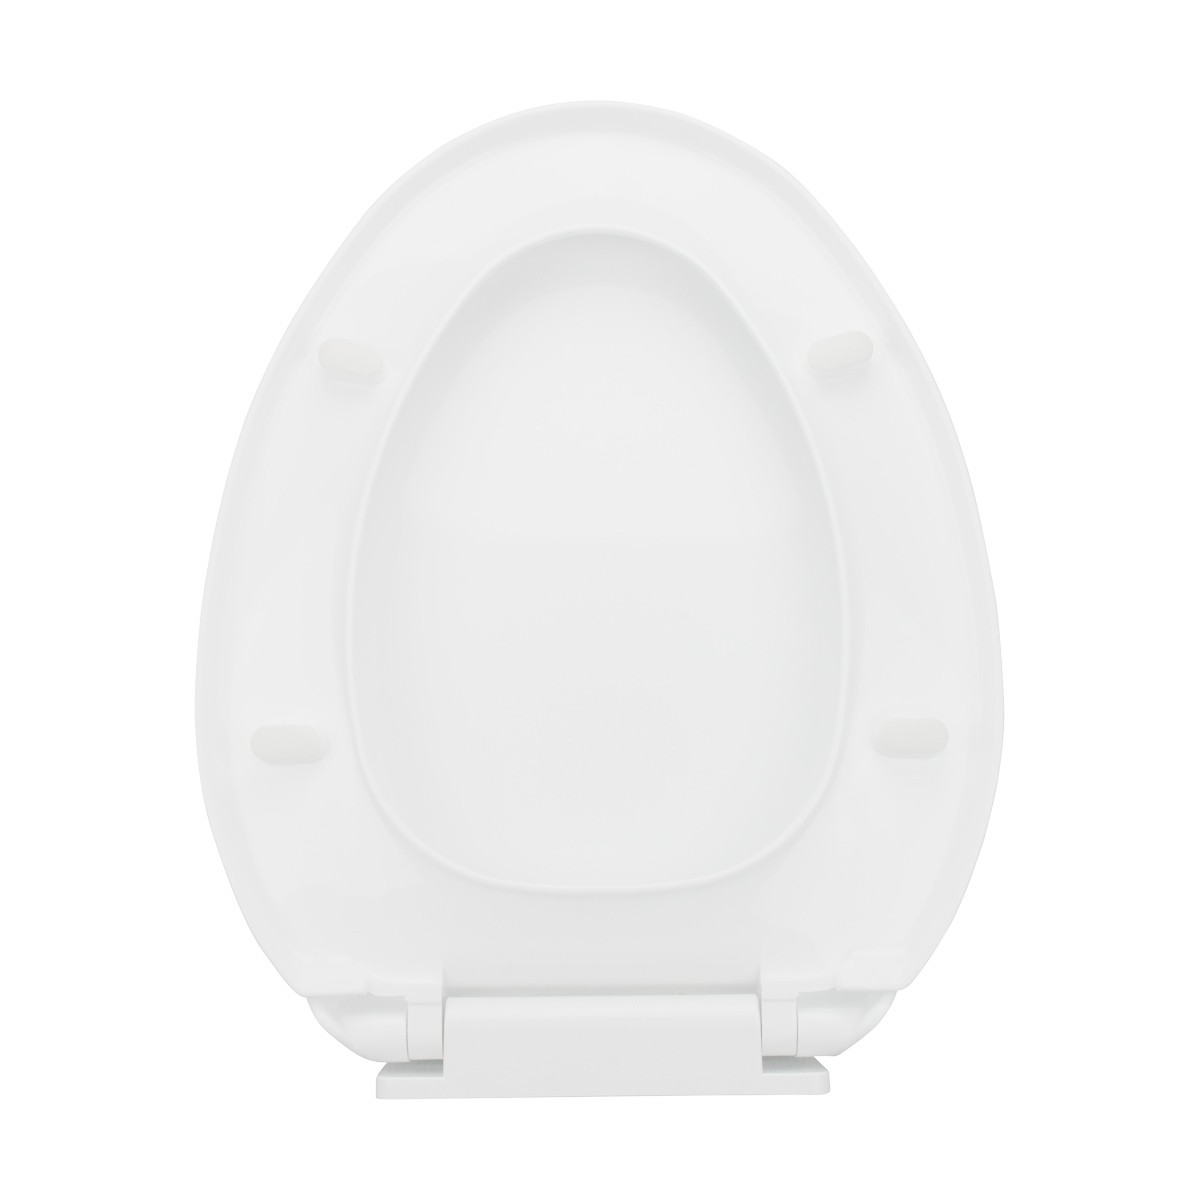 White Elongated Bathroom Toilet Seat Slow EZ Close No Slam Durable Plastic 3Pack elongated toilet seat toilet soft close seat plastic bathroom toilet seats